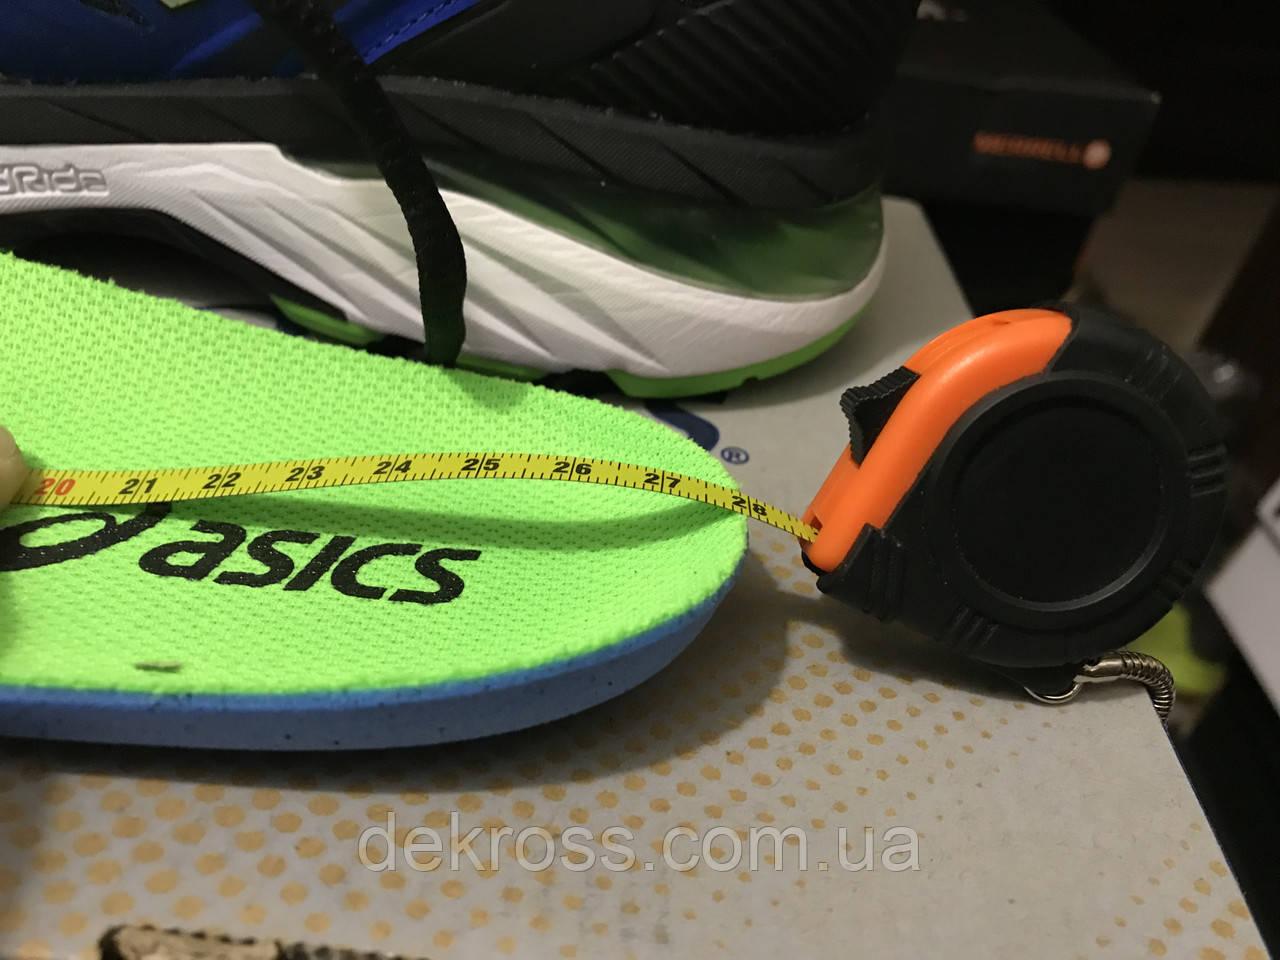 Кроссовки беговые ASICS GT-3000 5 Оригинал T705N  продажа 43b8a1cf76c6d